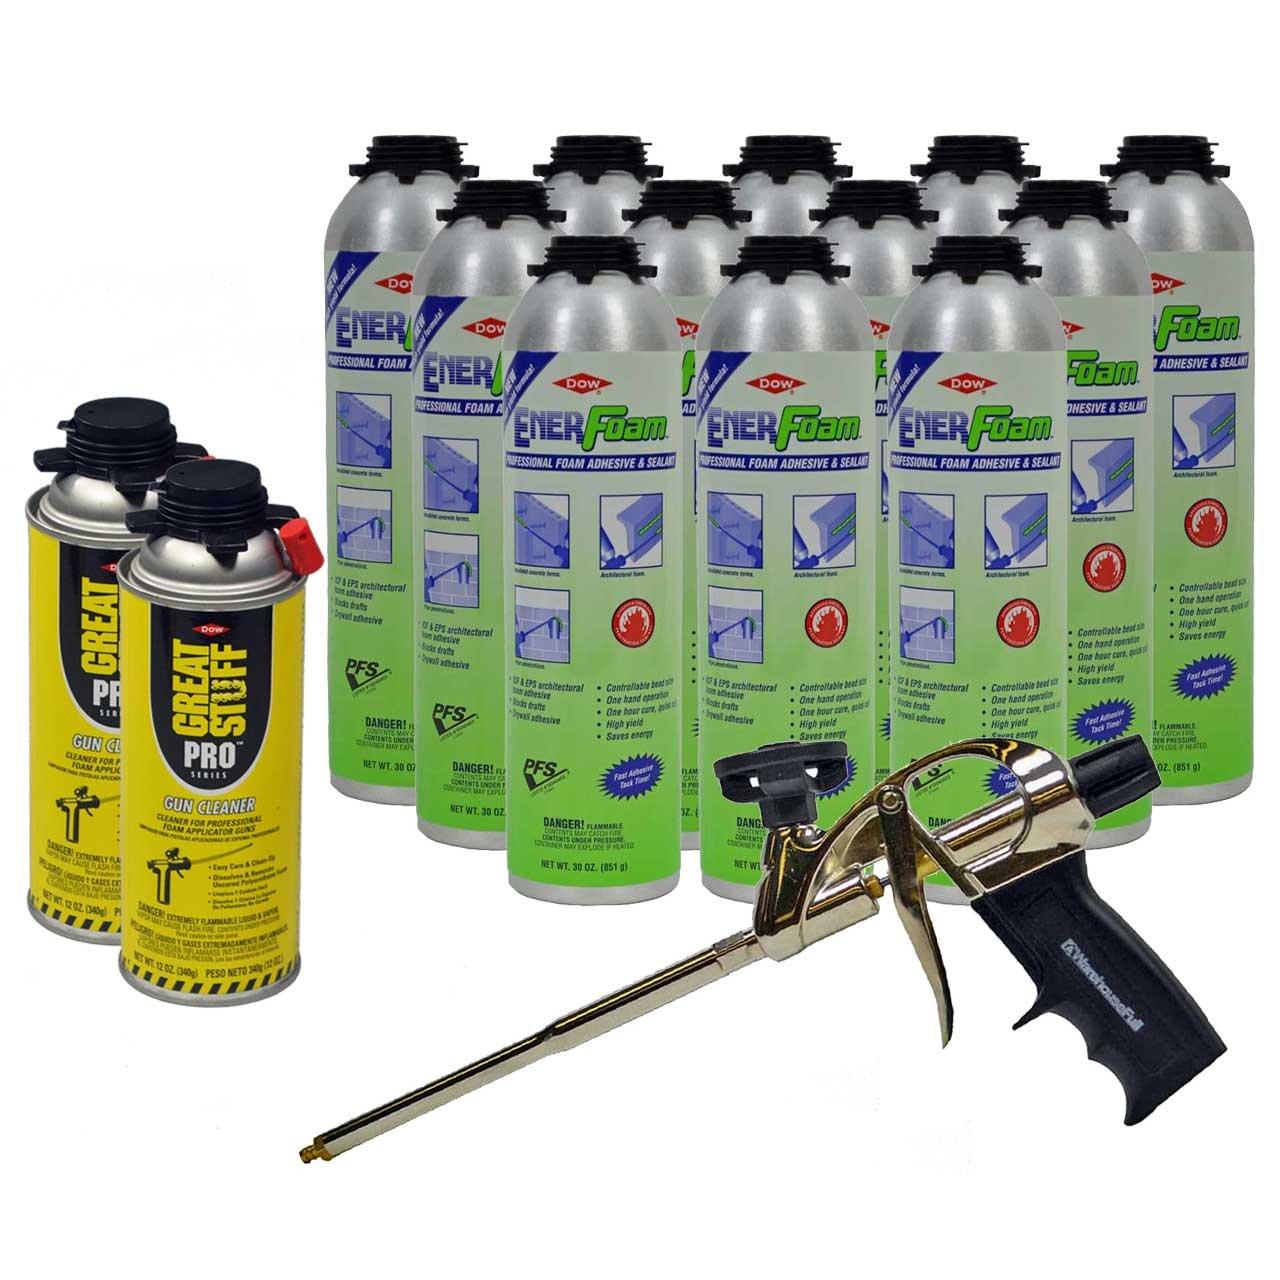 Dow Enerfoam 30oz Gun Dispensed Foam (12) + AWF Pro Foam Gun (1) + Great Stuff Pro foam Gun Cleaner (2) by Great Stuff